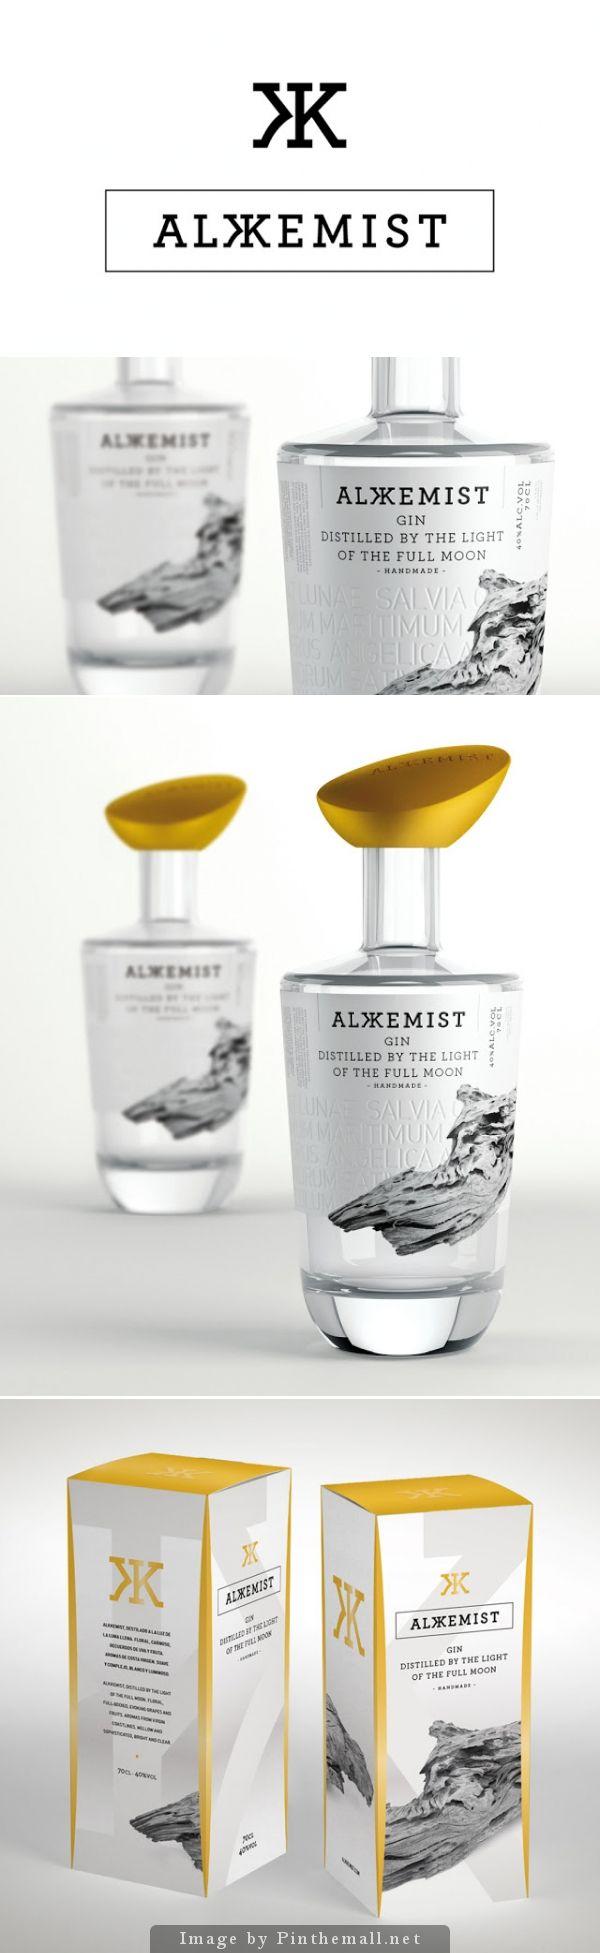 ALKKEMIST Gin Creative Agency: Series Nemo Type of work: Commercial work Location: Barcelona, Spain